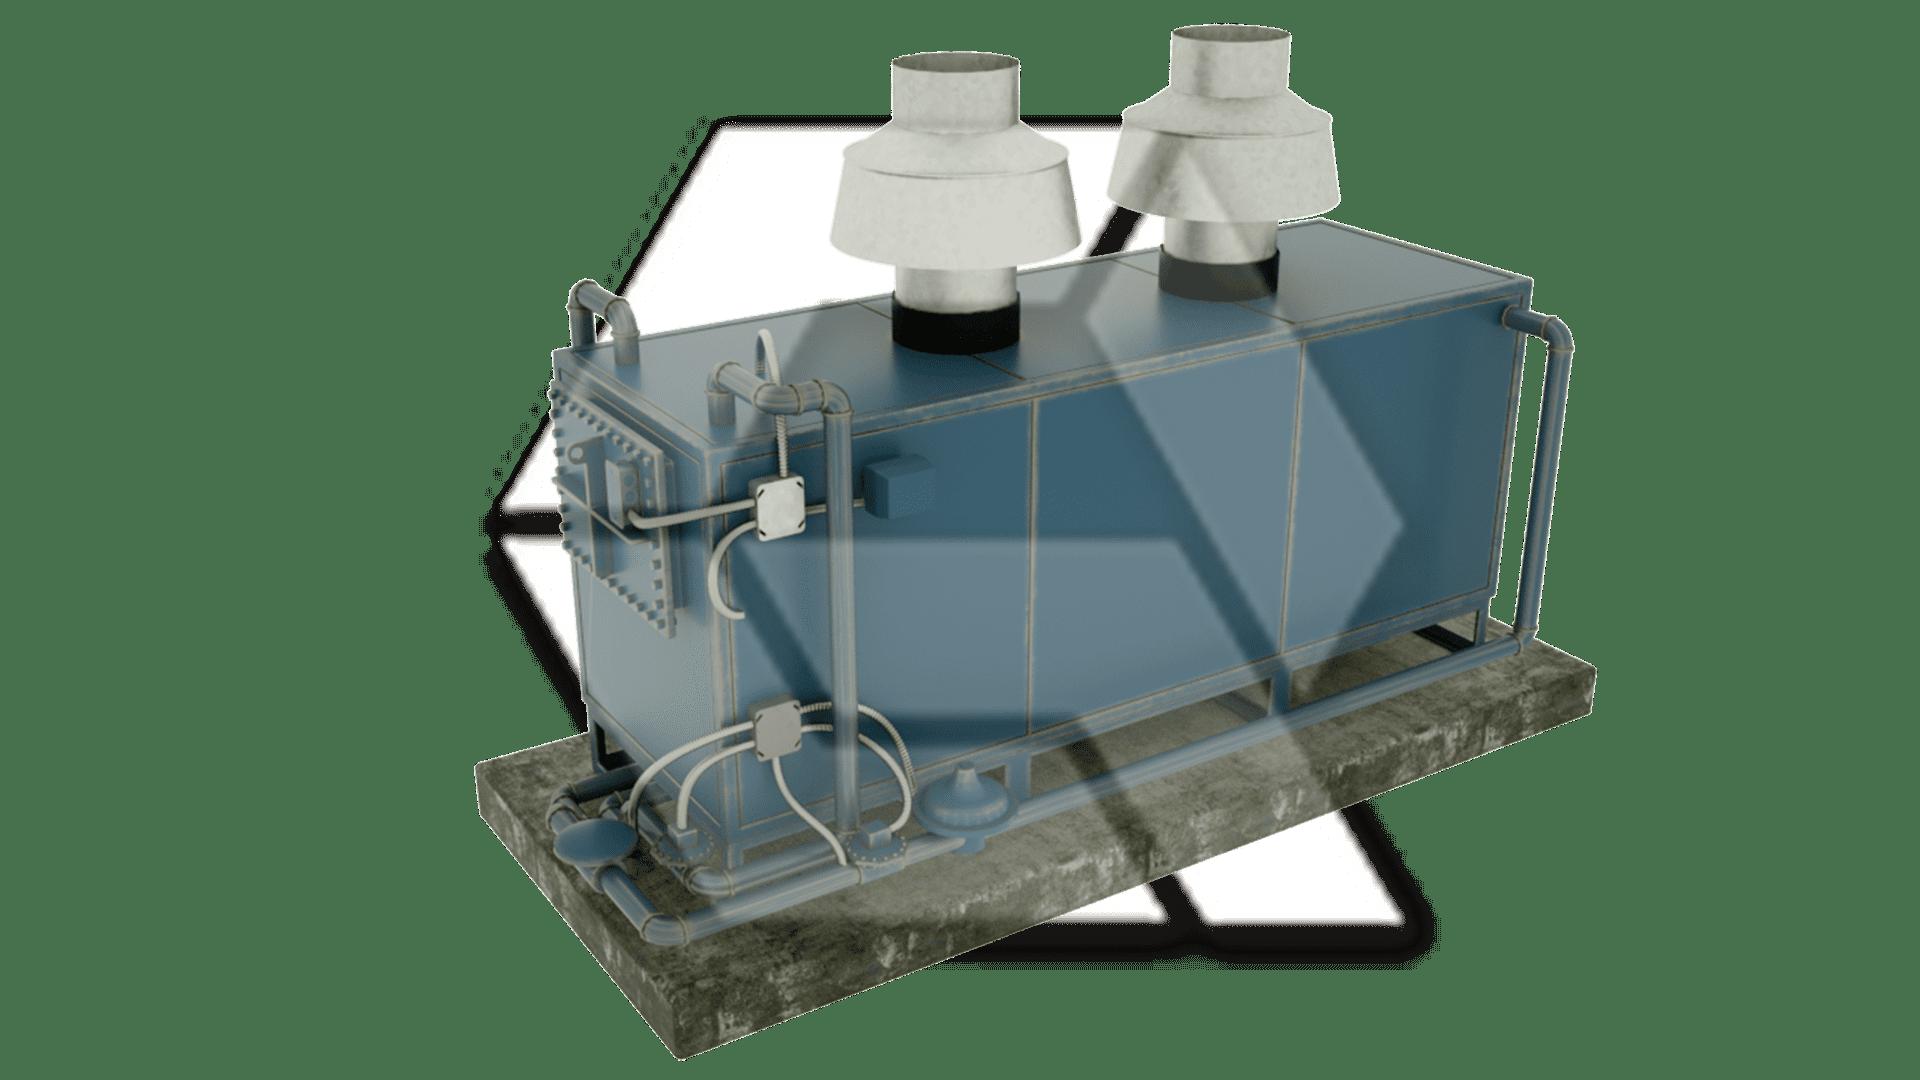 Blue Rectangular Boiler Closed